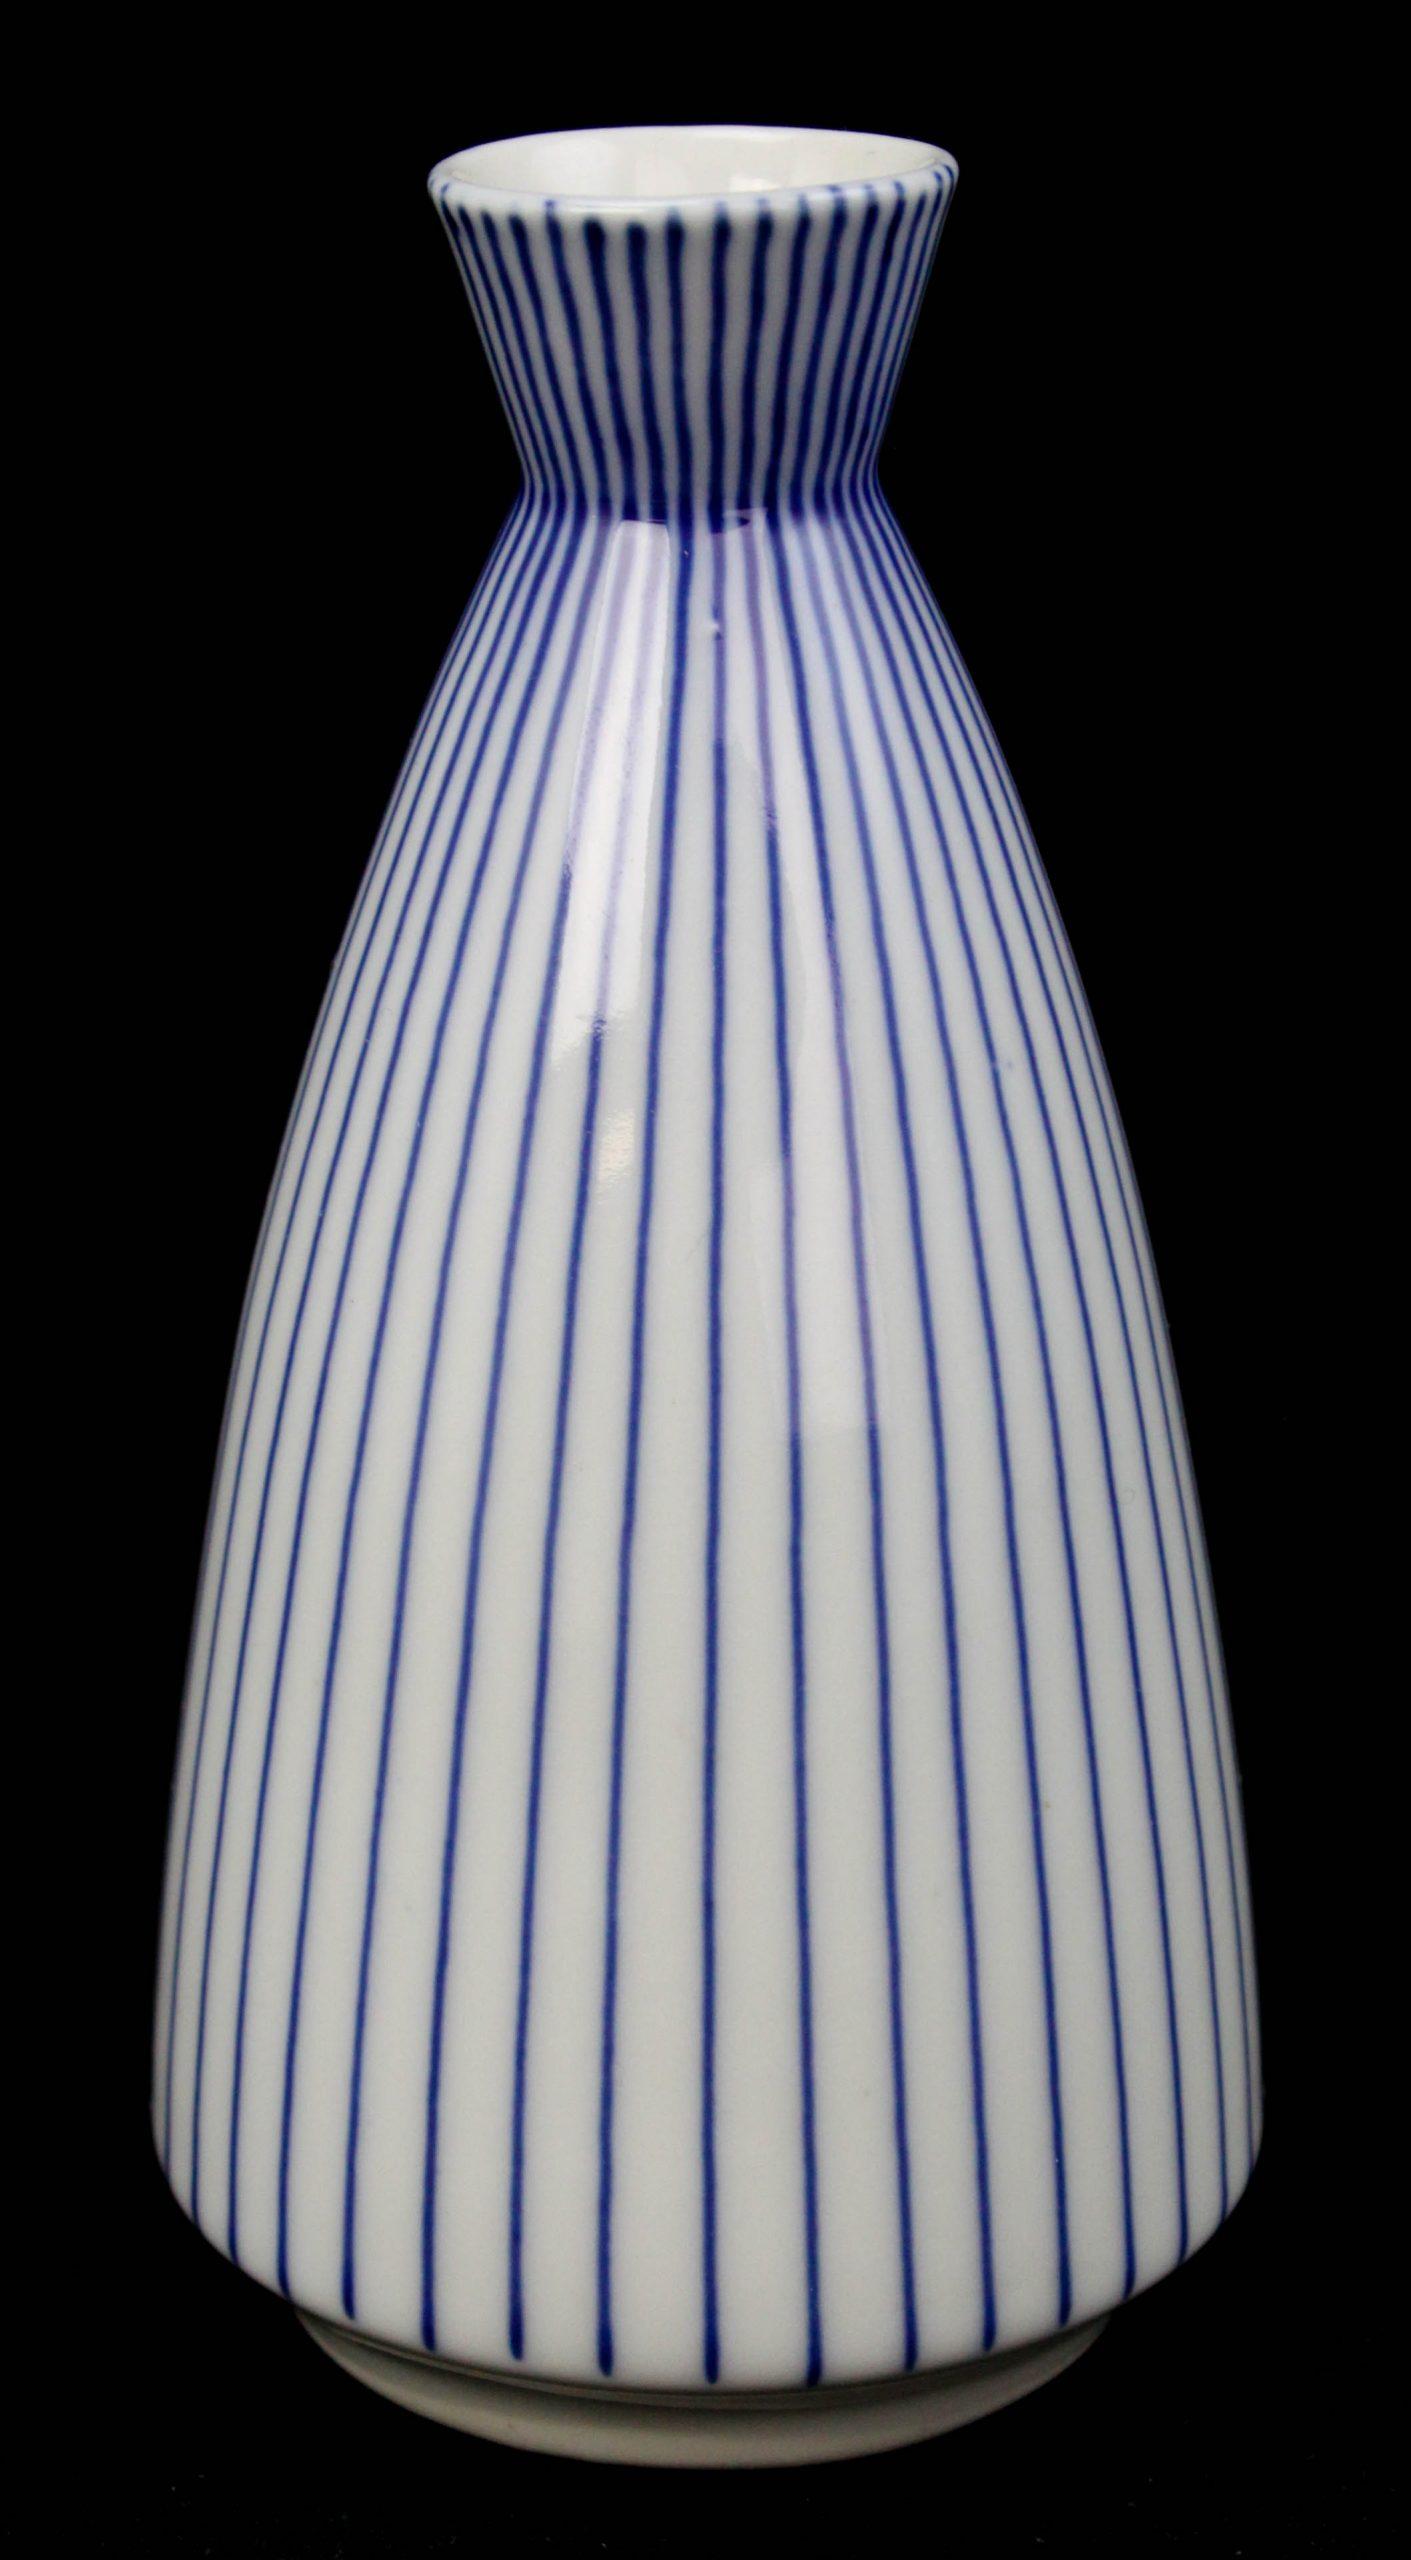 Vtg Modern Design White Vertical Cobalt Striped Porcelain Vase Sake Decanter L3z inside dimensions 2118 X 3844